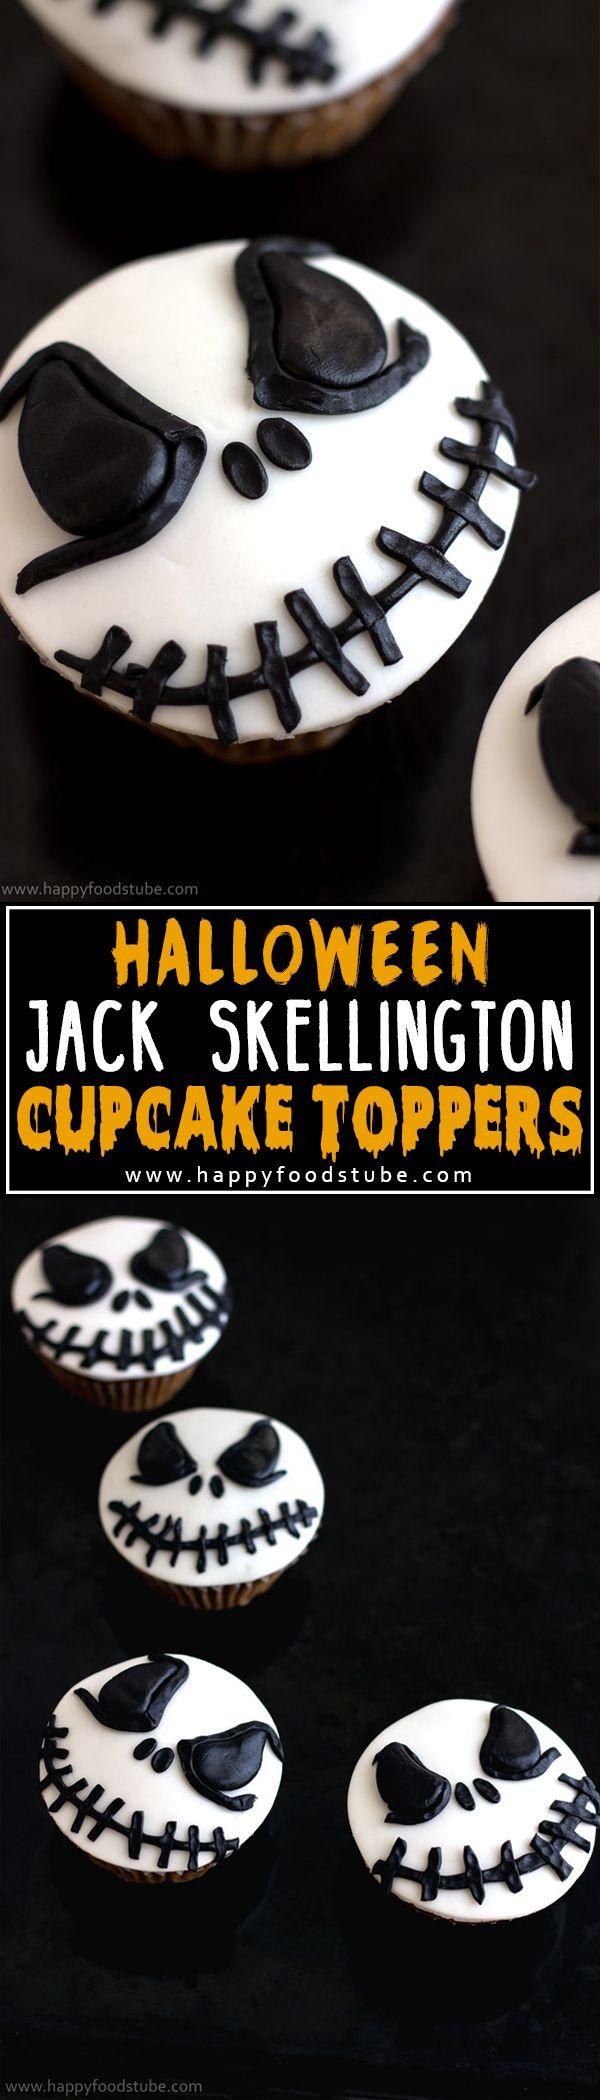 How to make Halloween Jack Skellington Cupcake Toppers. Easy cake/cupcake decorating tutorial! | happyfoodstube.com